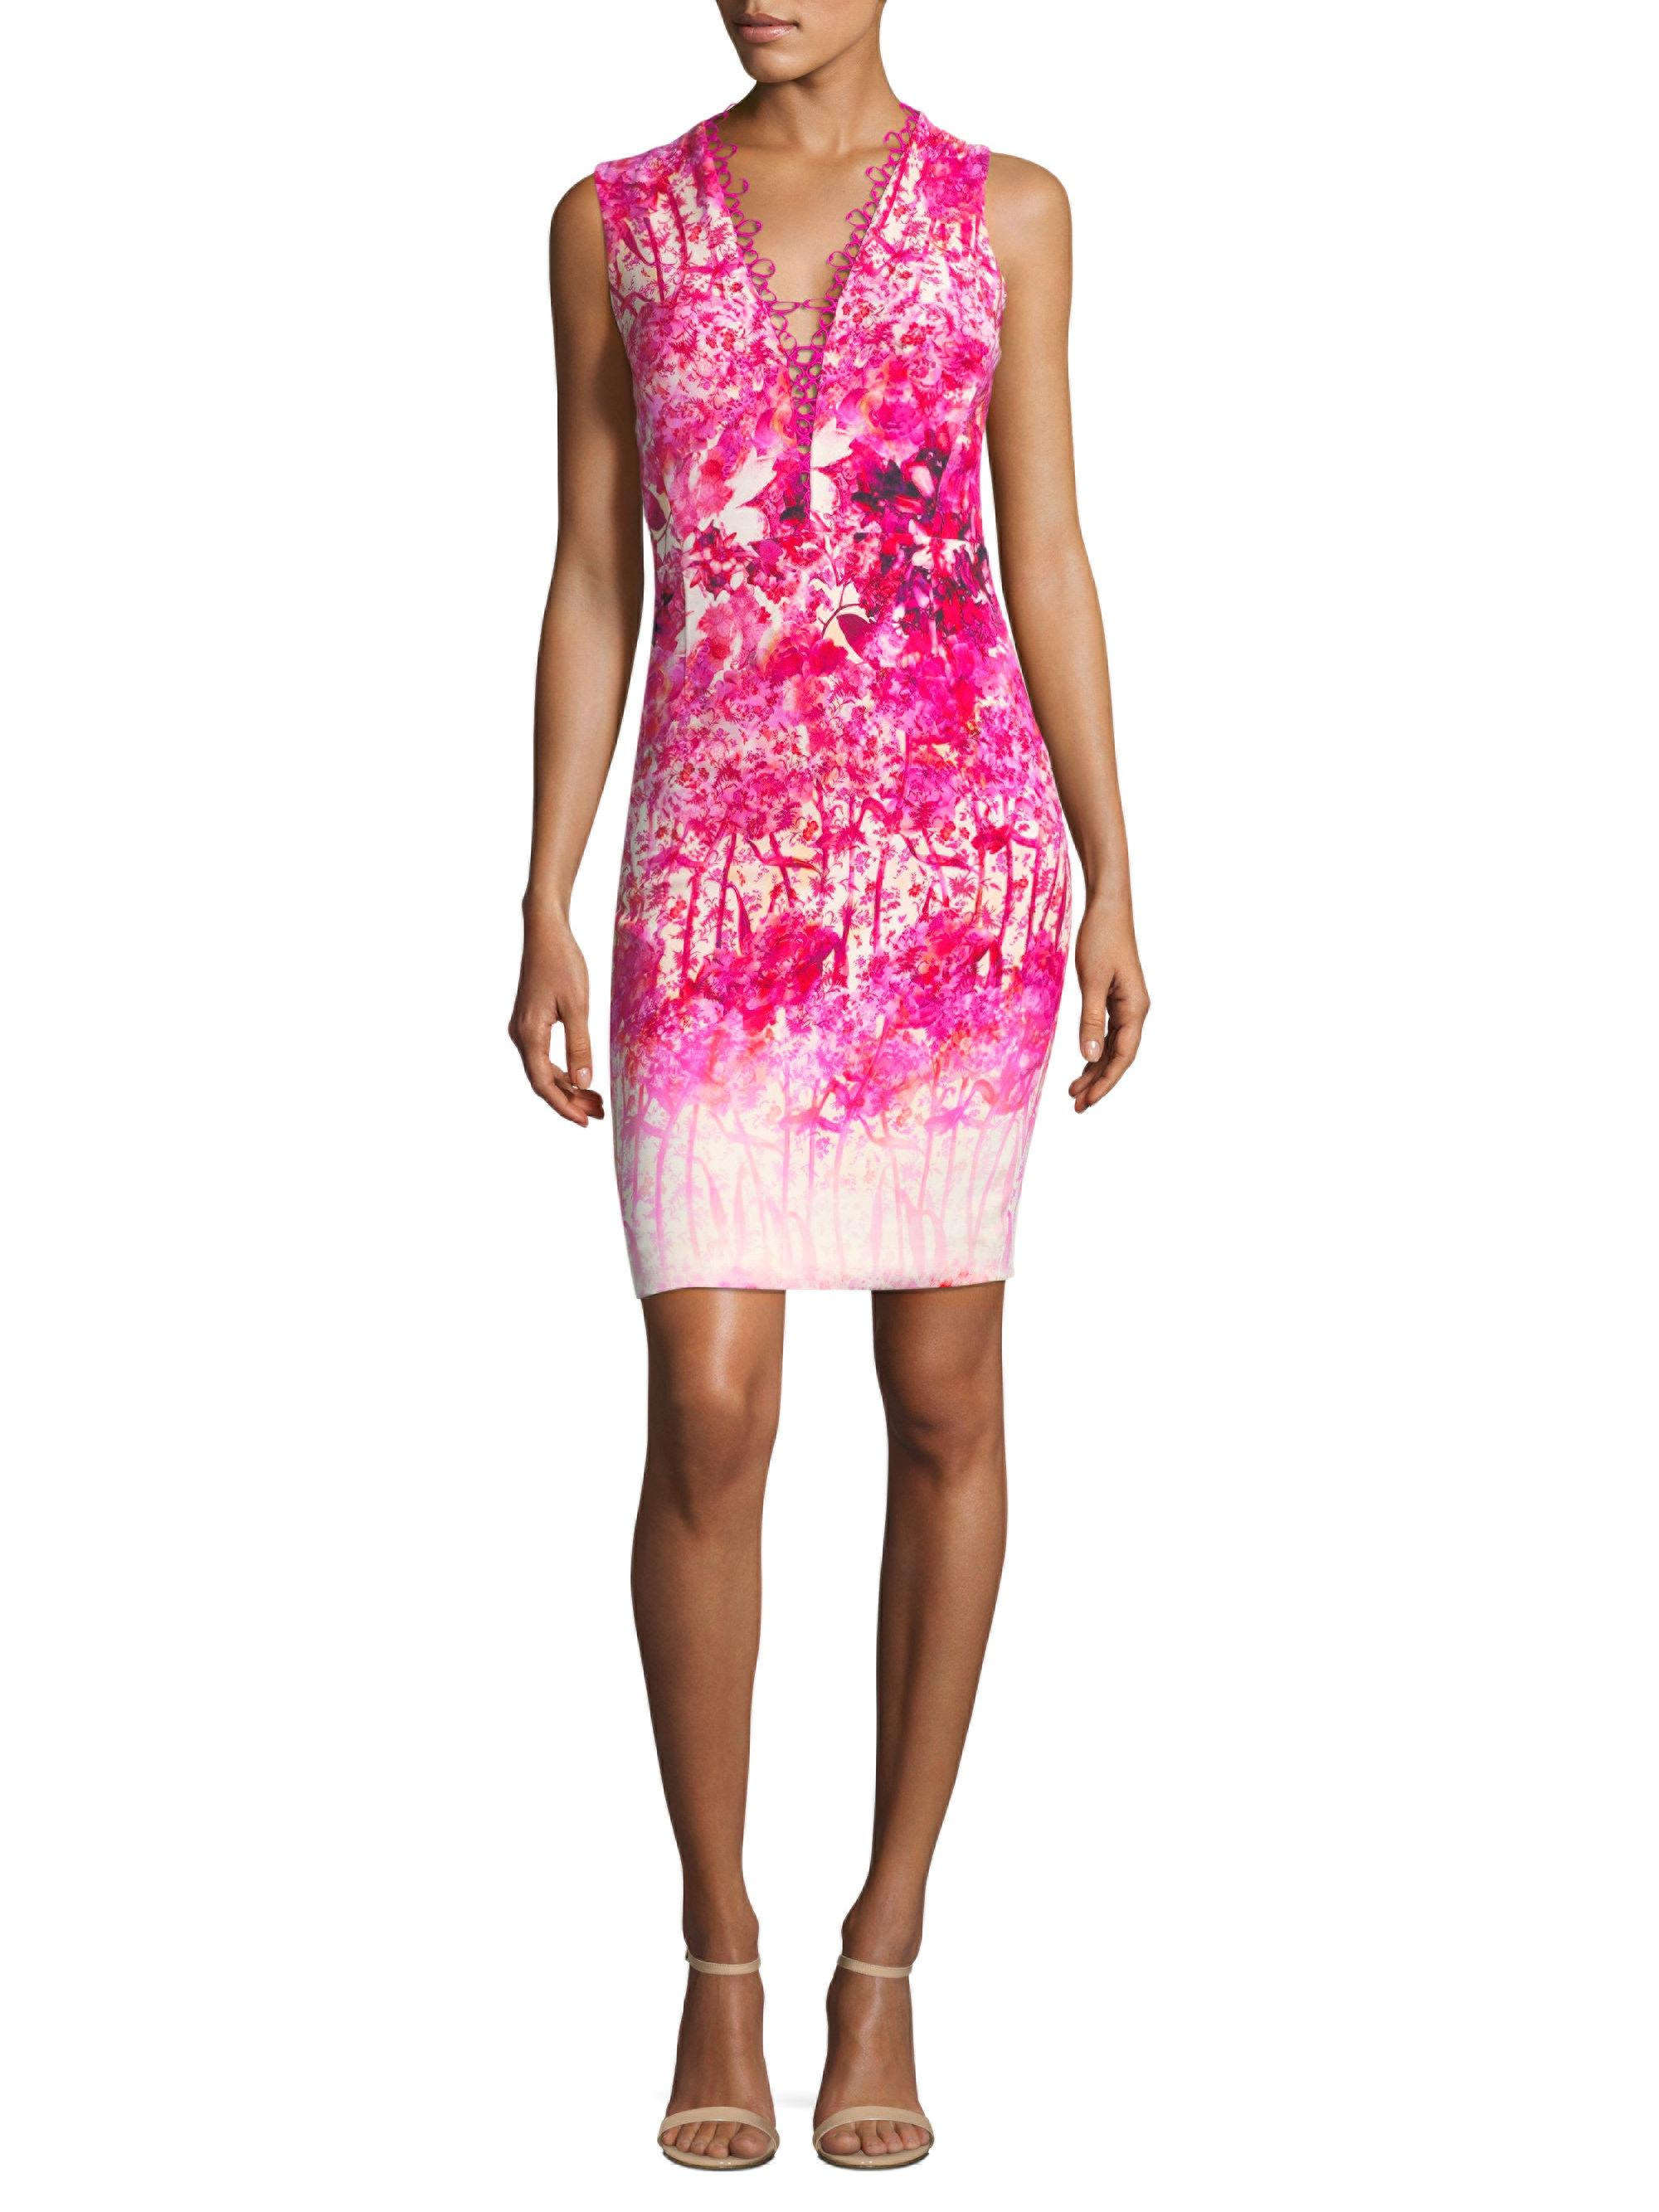 8decb28a4a23b Elie Tahari Floral Sheath Dress in Pink - Lyst